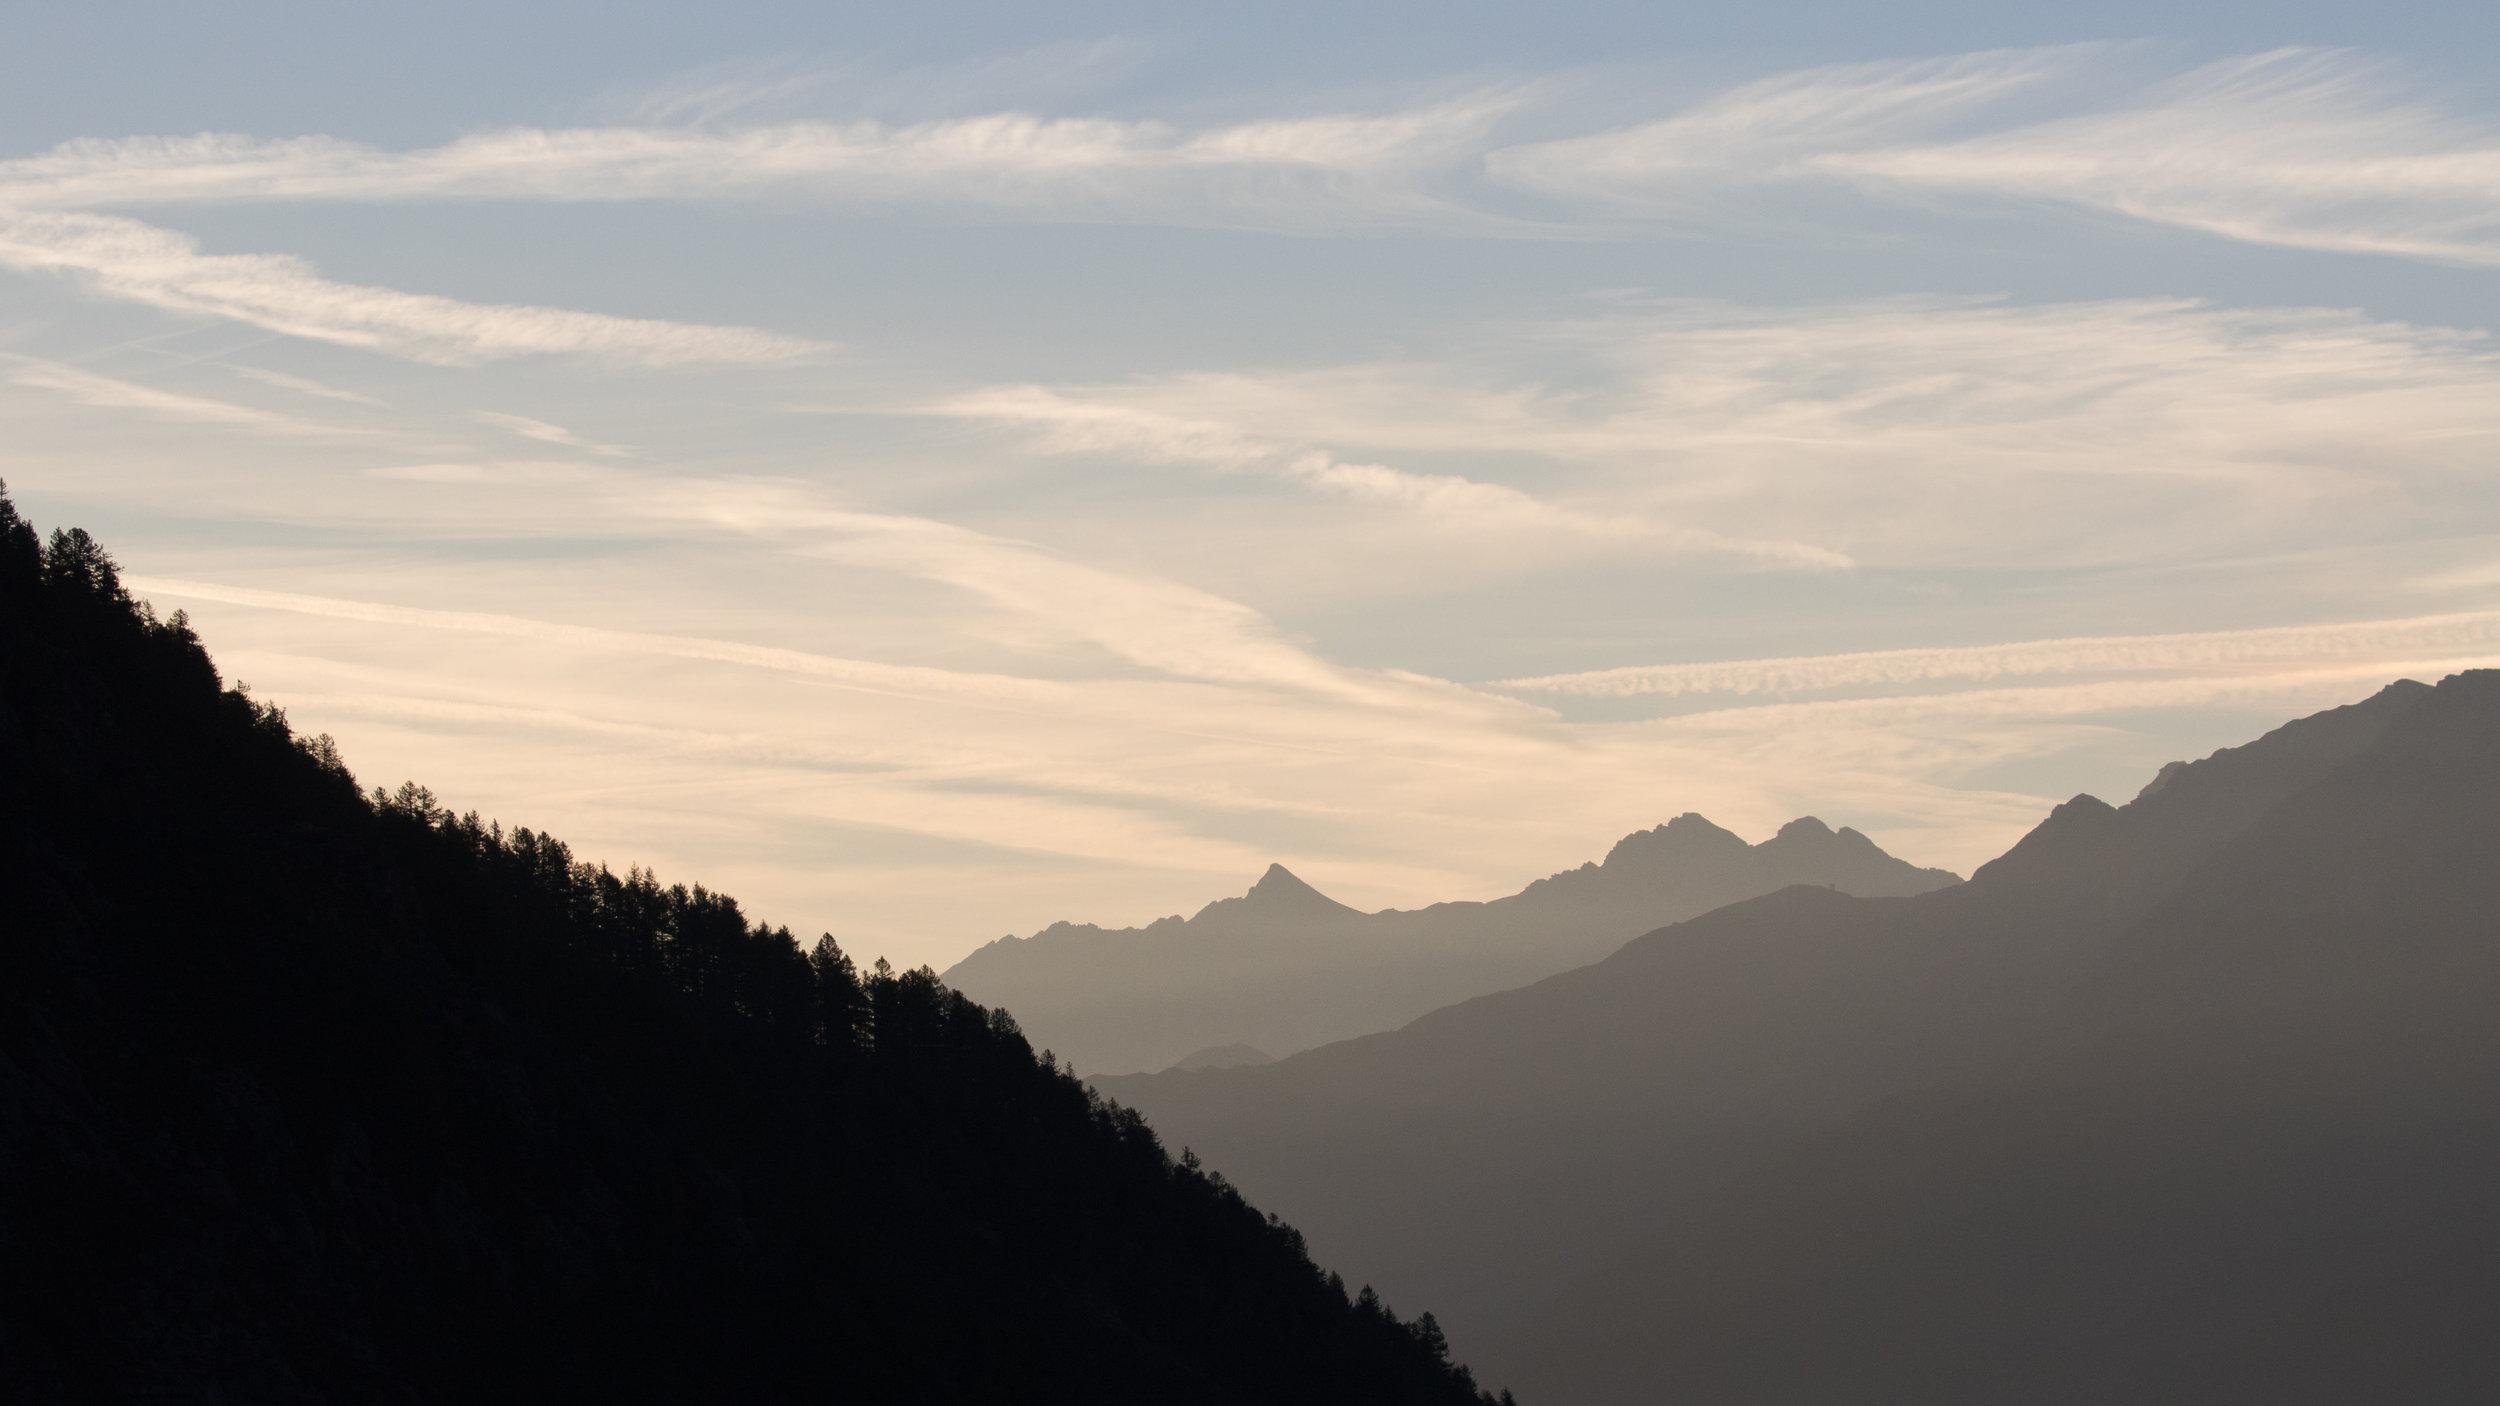 landscape-photography-sunrise-salva-fauna